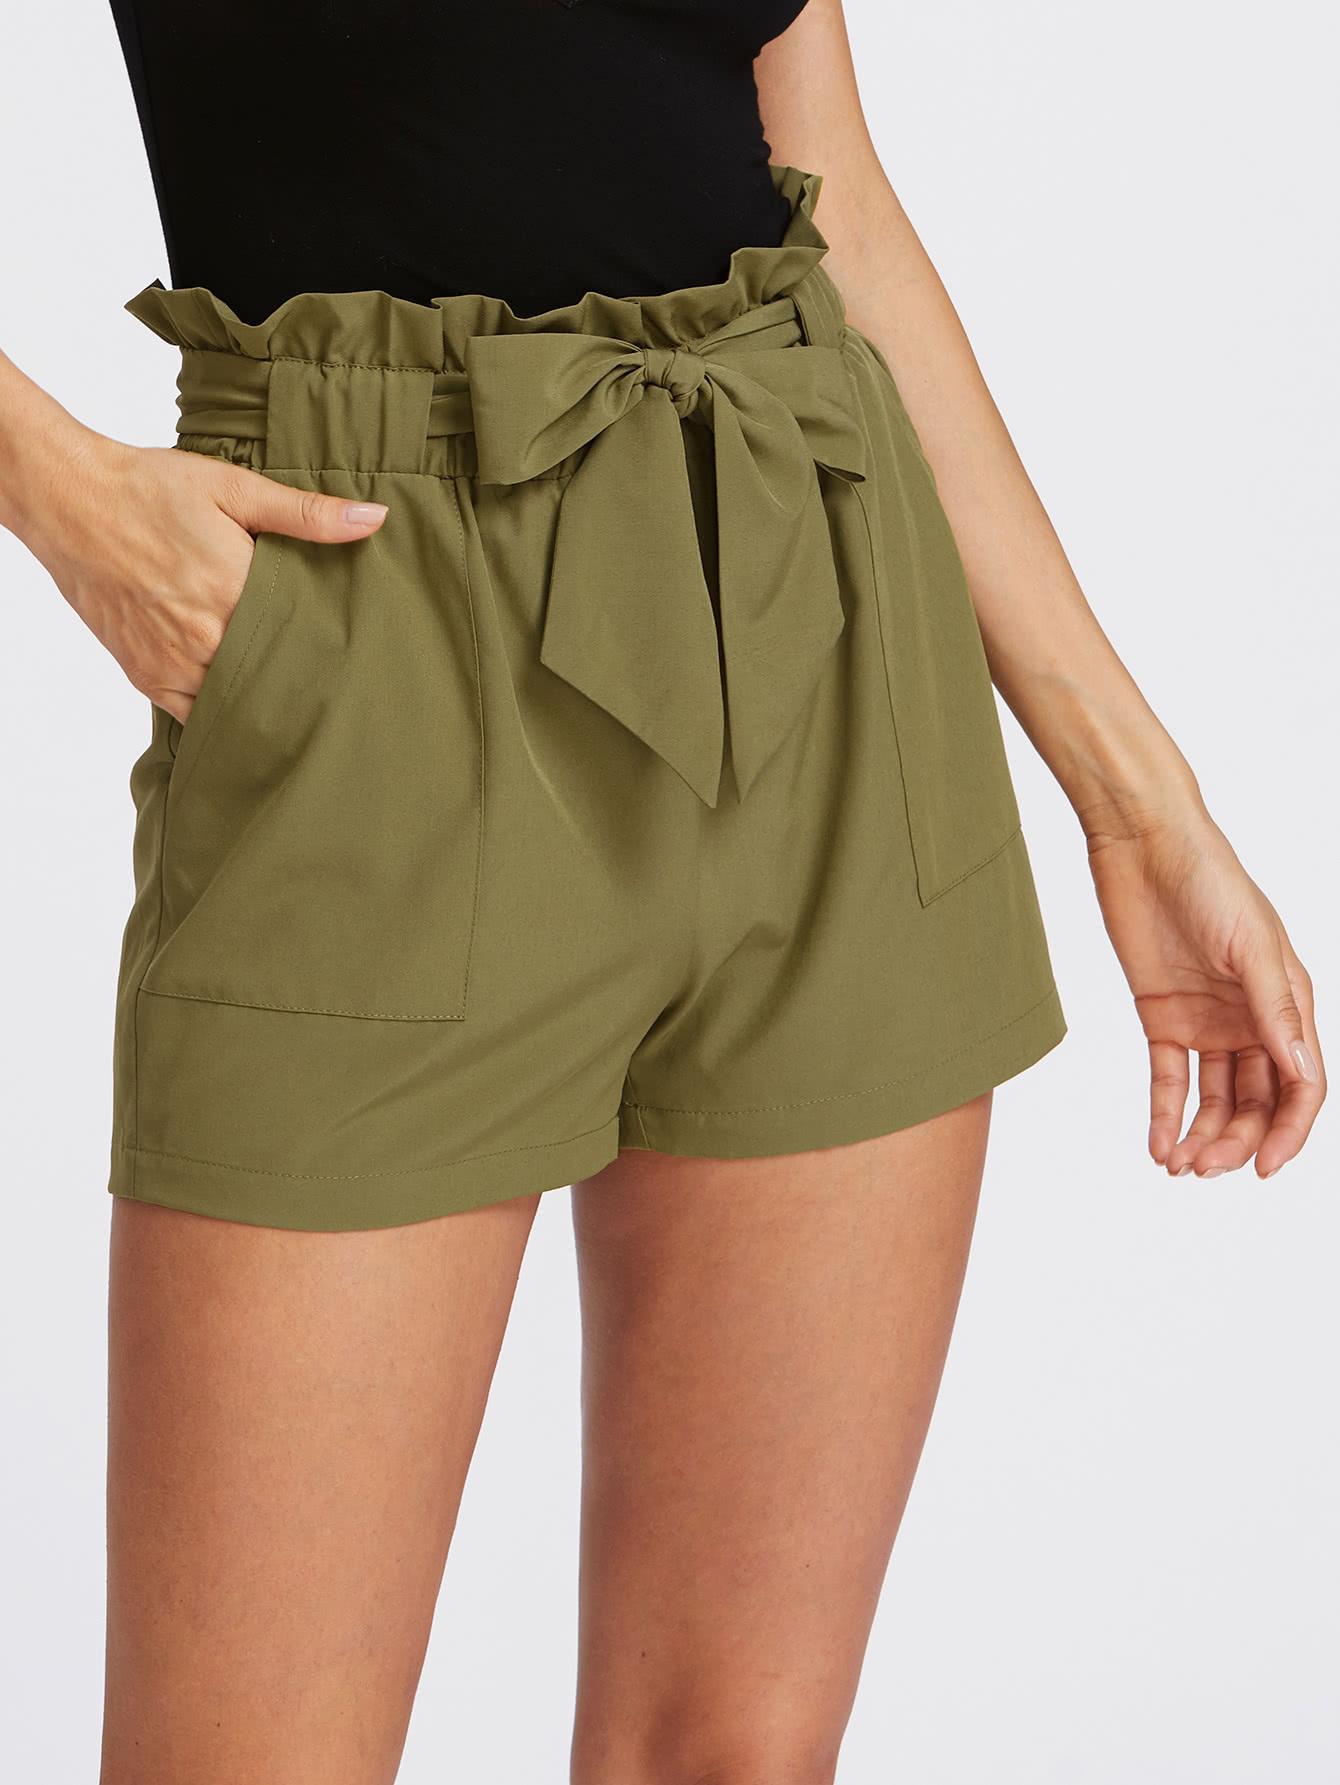 Self Tie Ruffle Waist Shorts self tie waist ruffle skirt